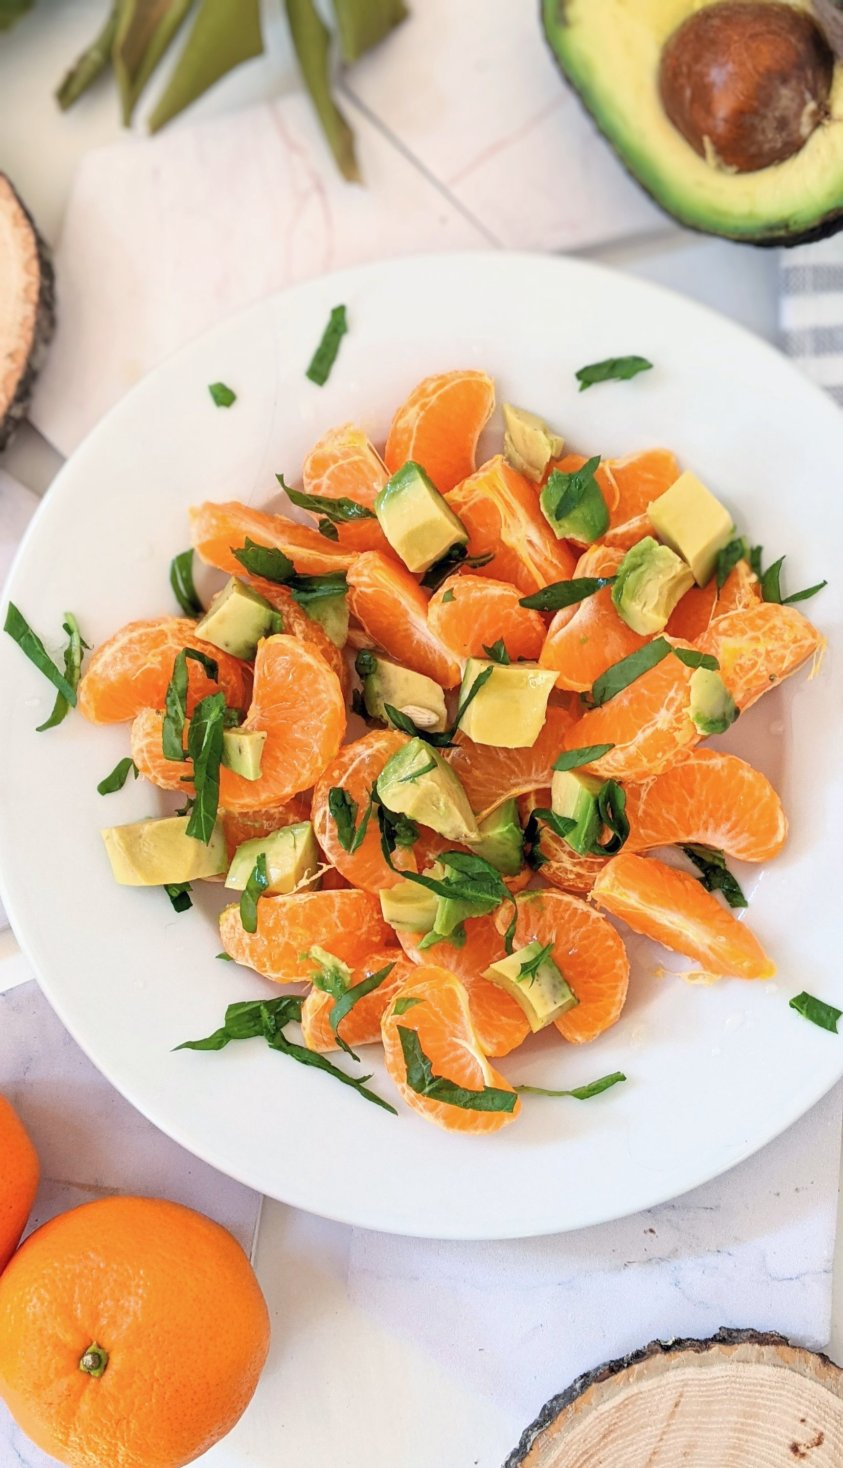 vegan gluten free plant based summer salas recipes avocado fruit salads with basil dressing citrus avocado salad recipe raw vegan breakfast ideas